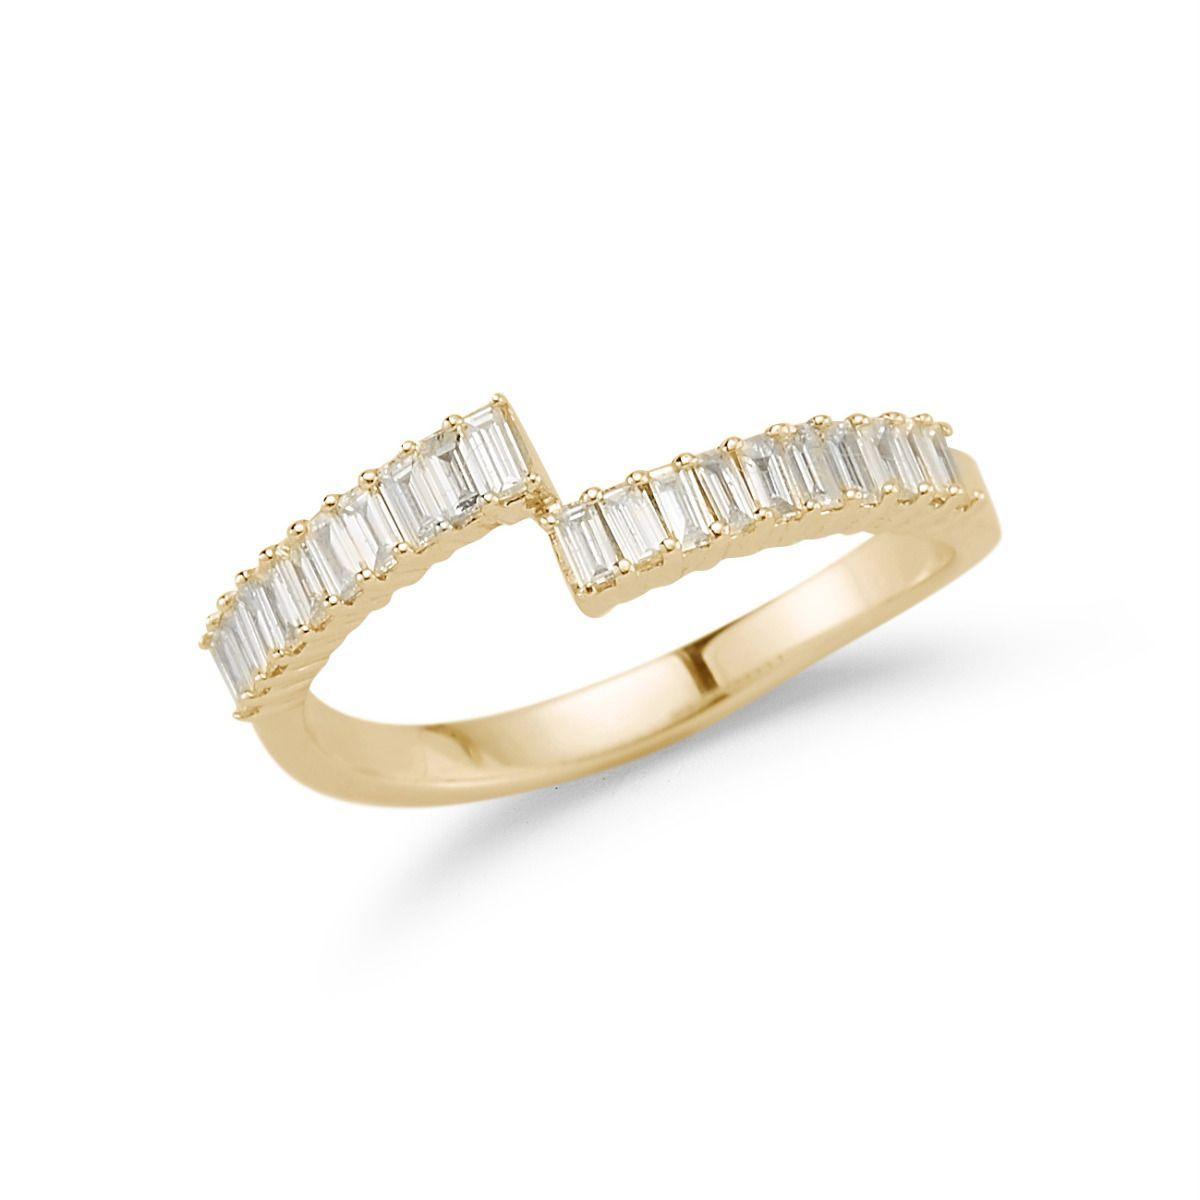 c9f7b7de307ed Sadie Pearl Split Baguette Ring in 2019   wish list.   Baguette ring ...